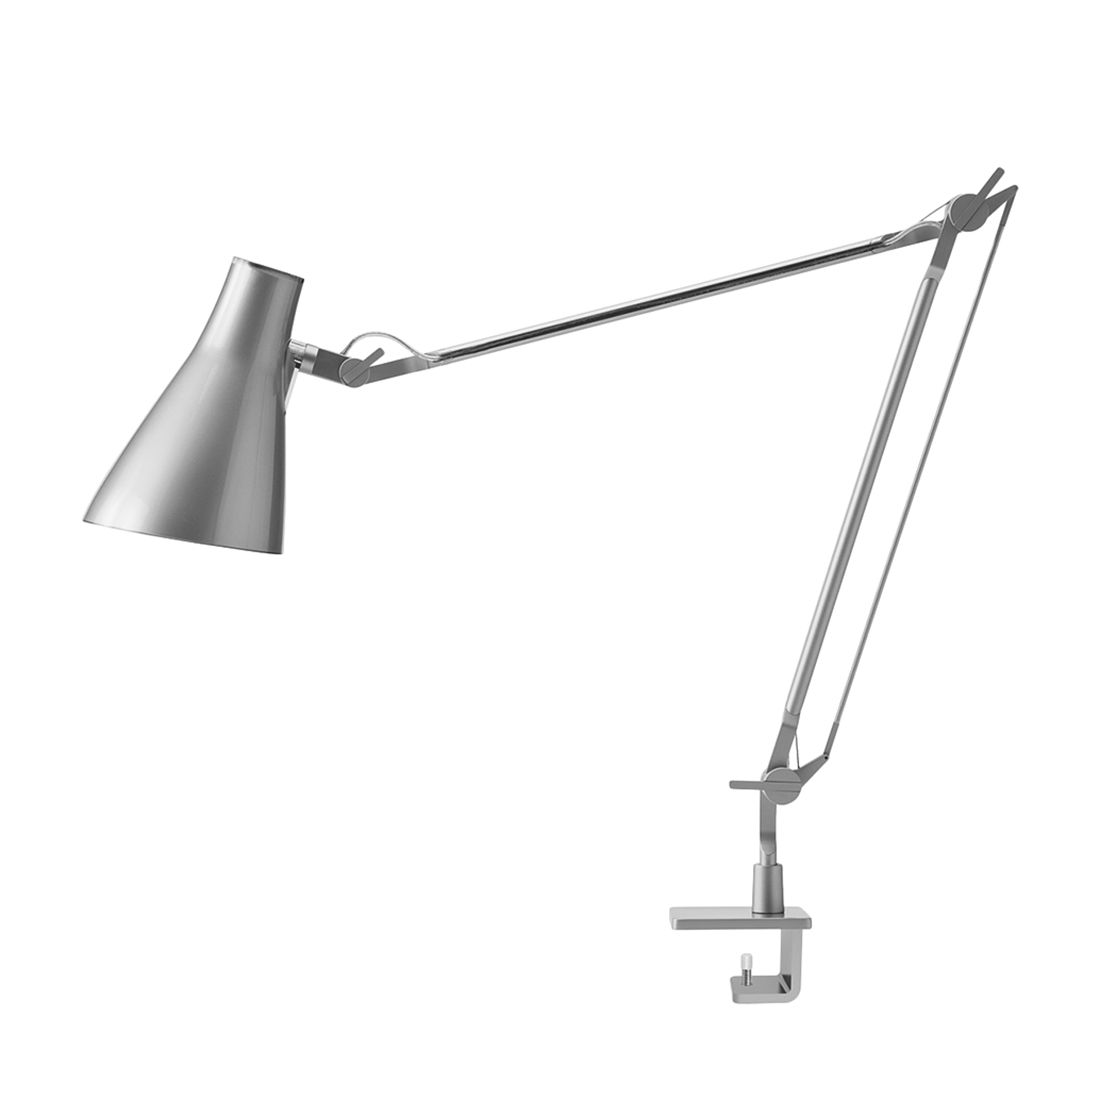 Tischleuchte Solus 2 ● Metall/Kunststoff ● Grau ● 1-flammig- Blanke Design A+